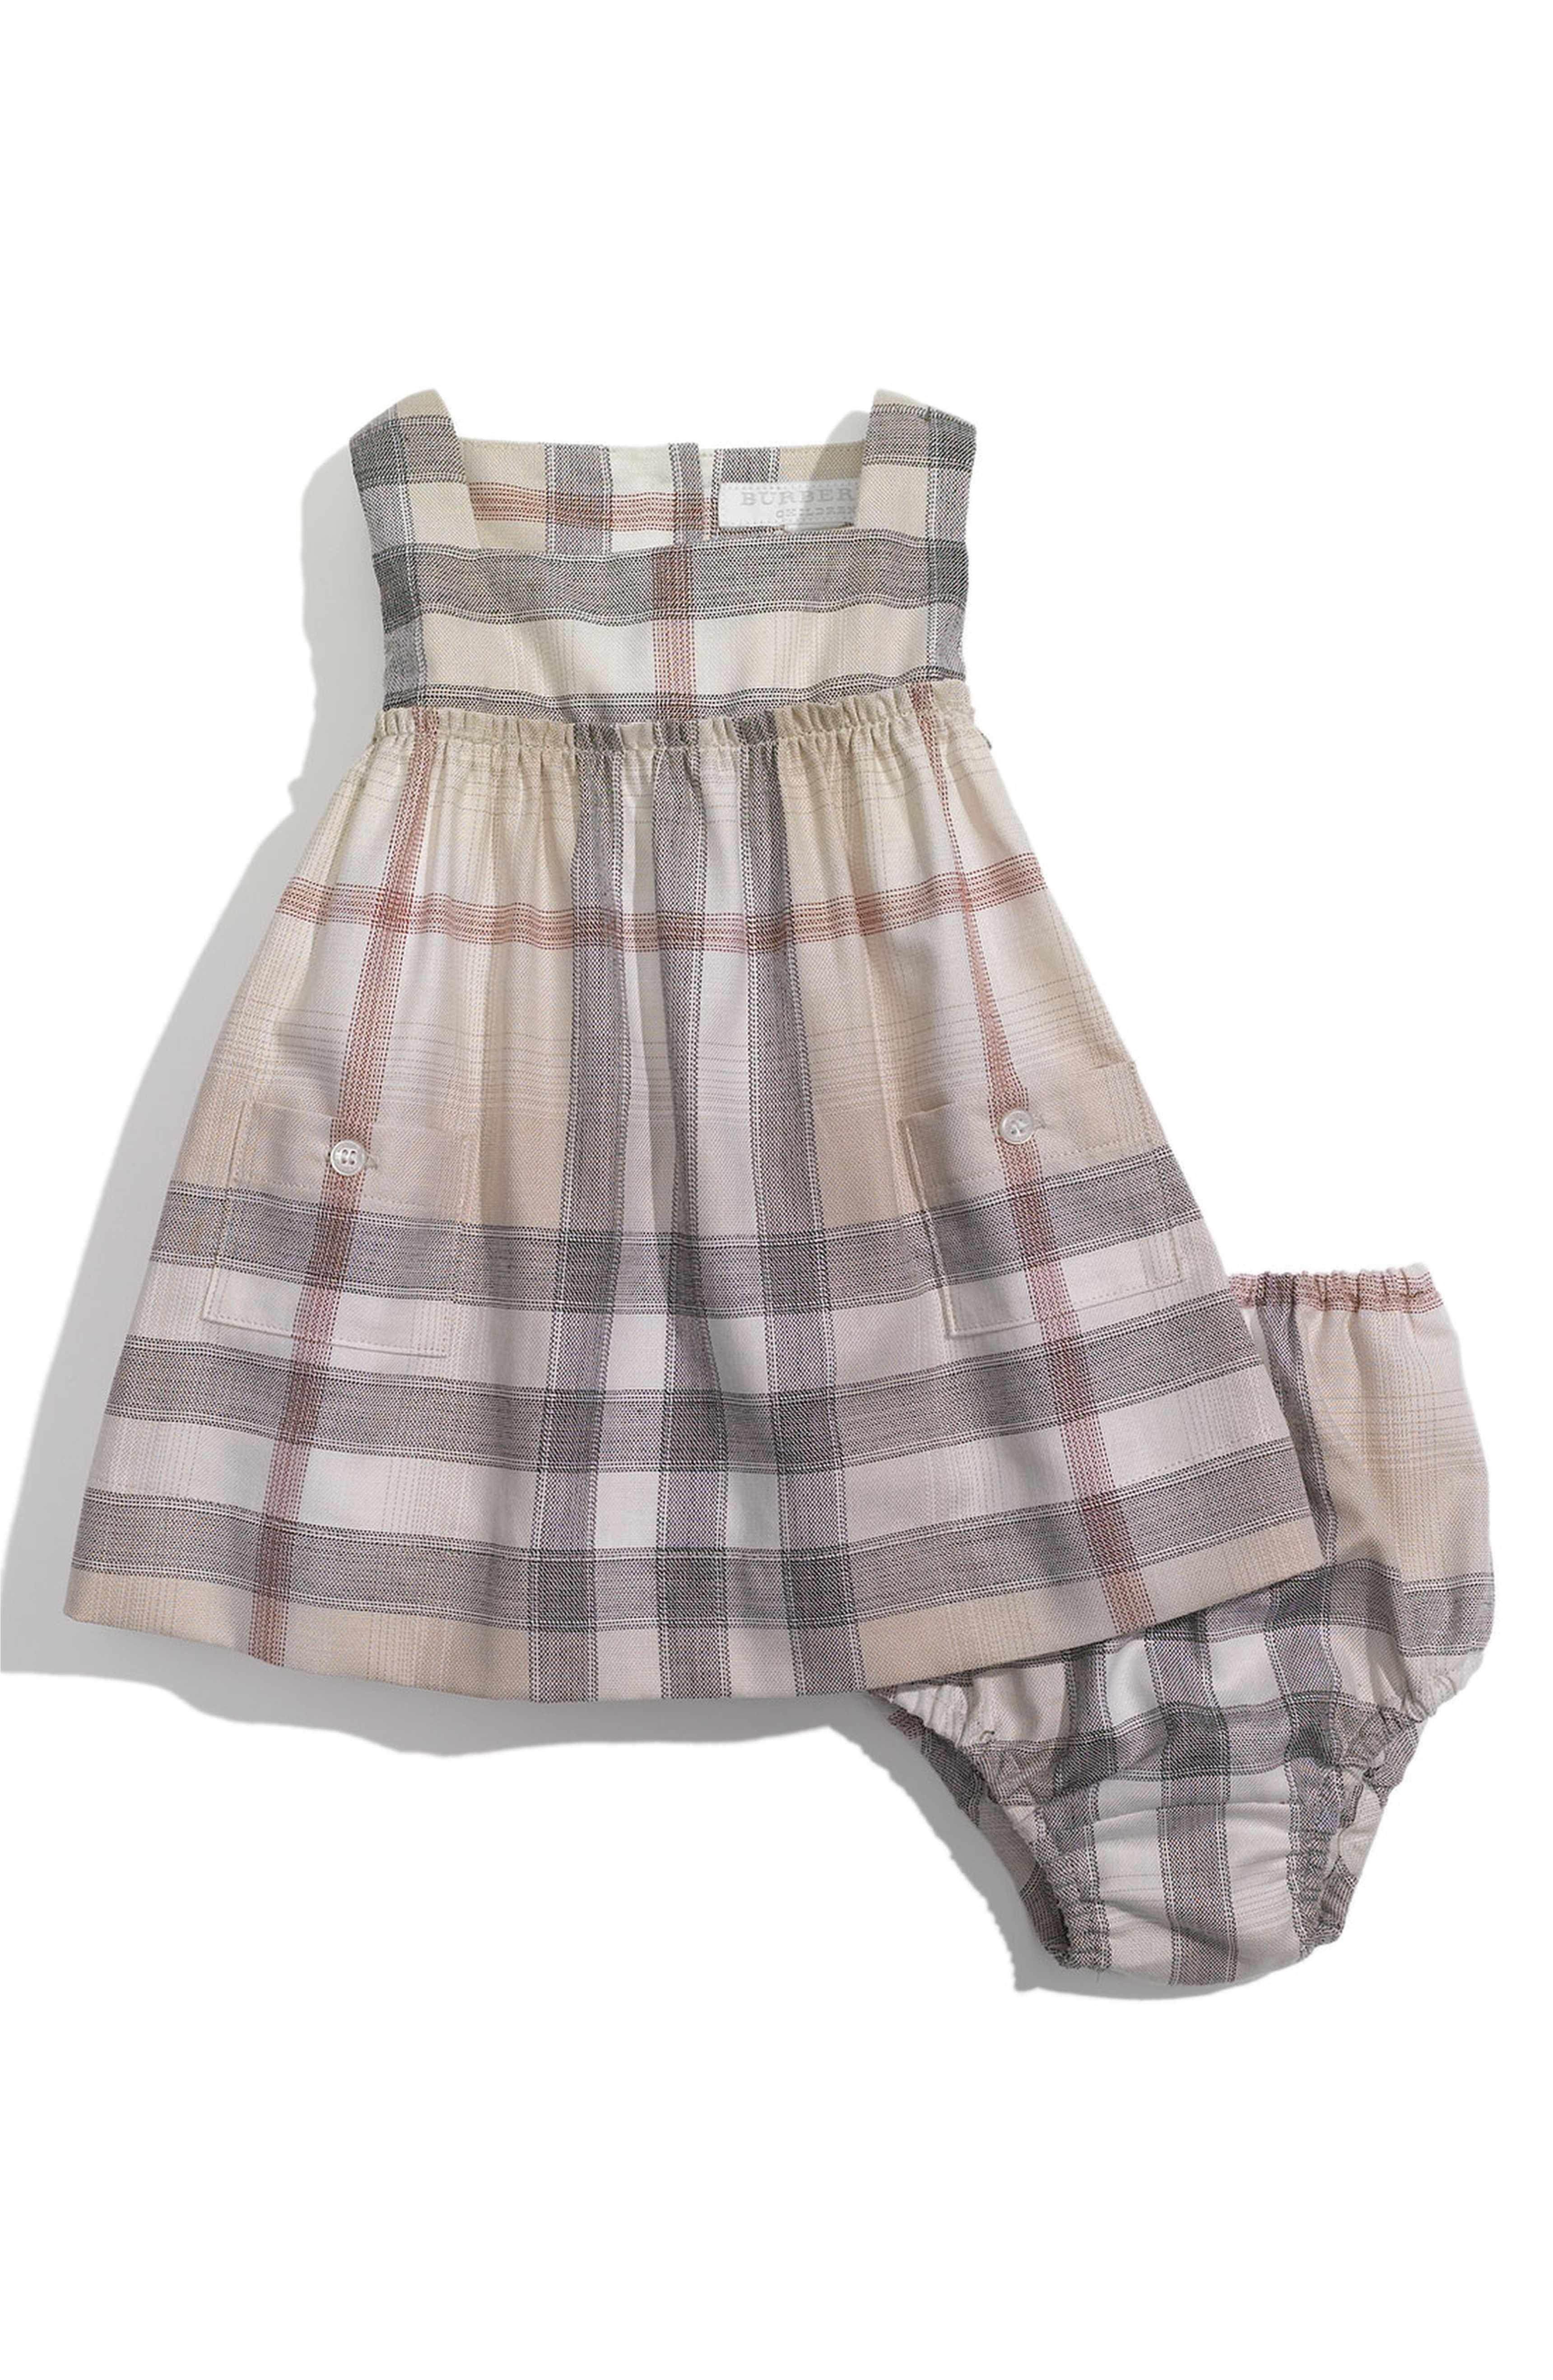 Main Image Burberry Gauzy Check Dress Infant